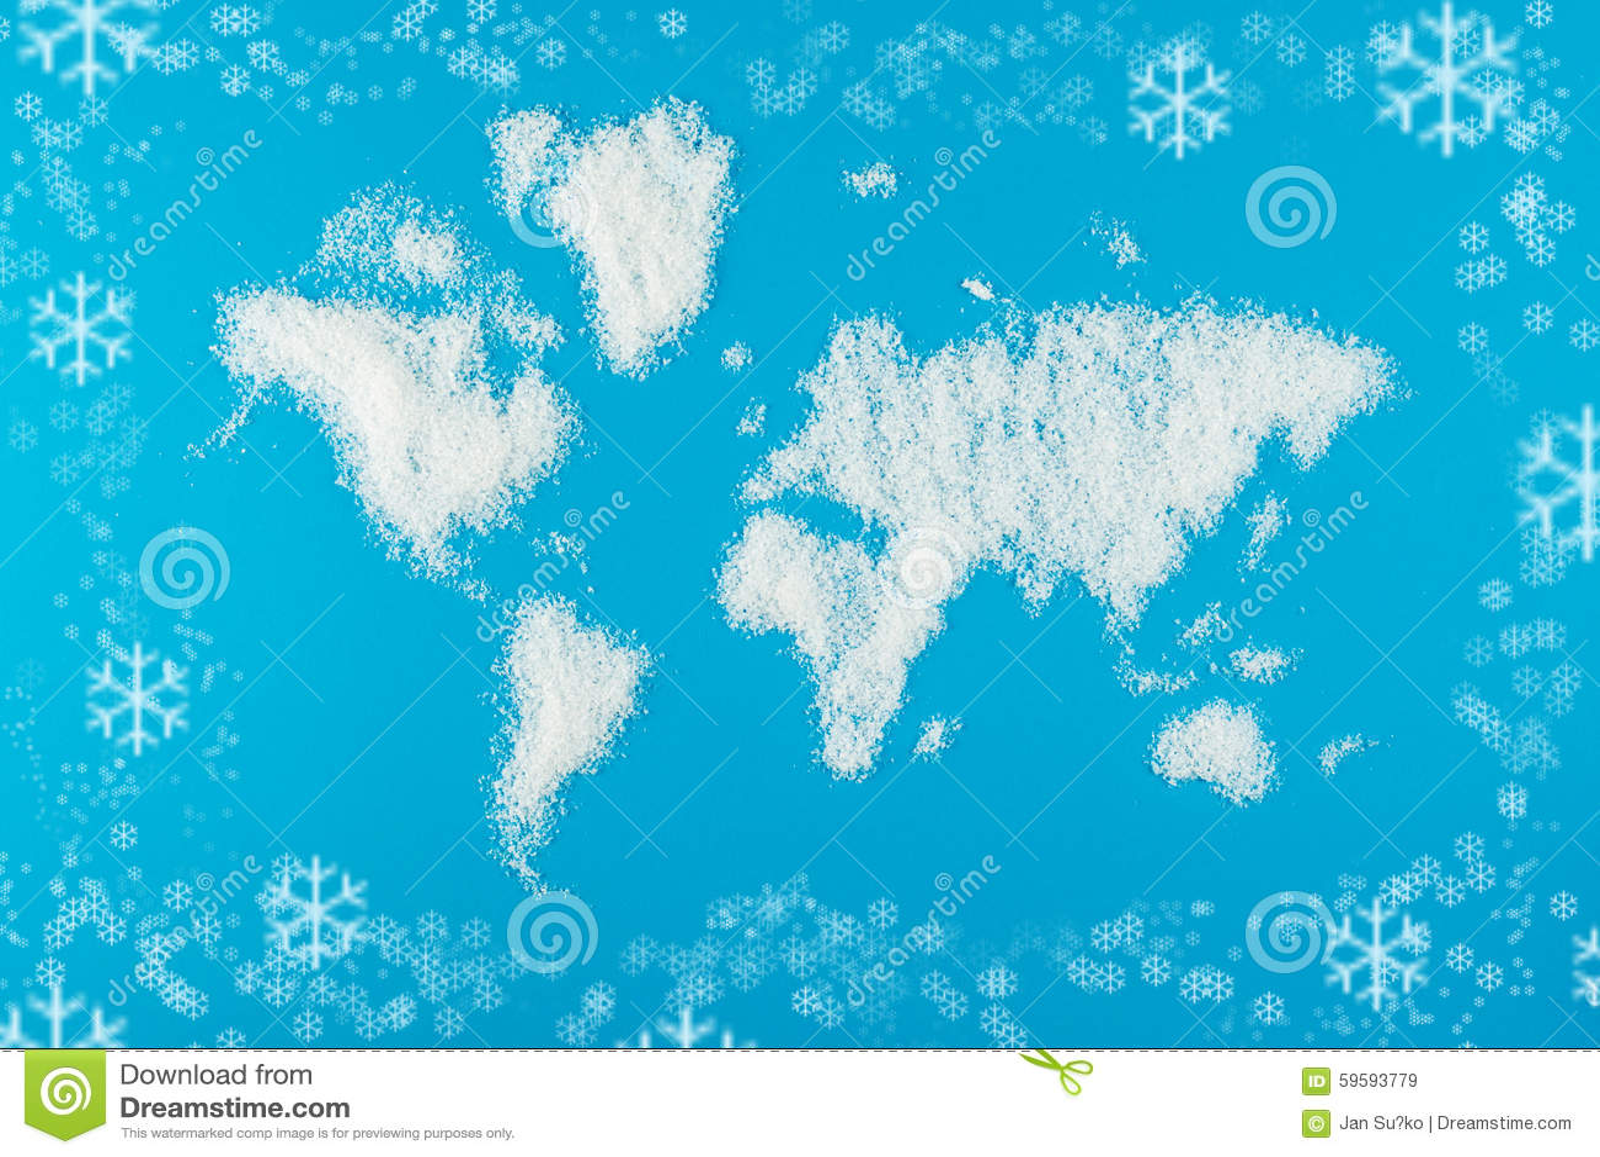 Ice Age Map Of The World.New Ice Age Stock Image Image Of Island Climate Irregular 59593779